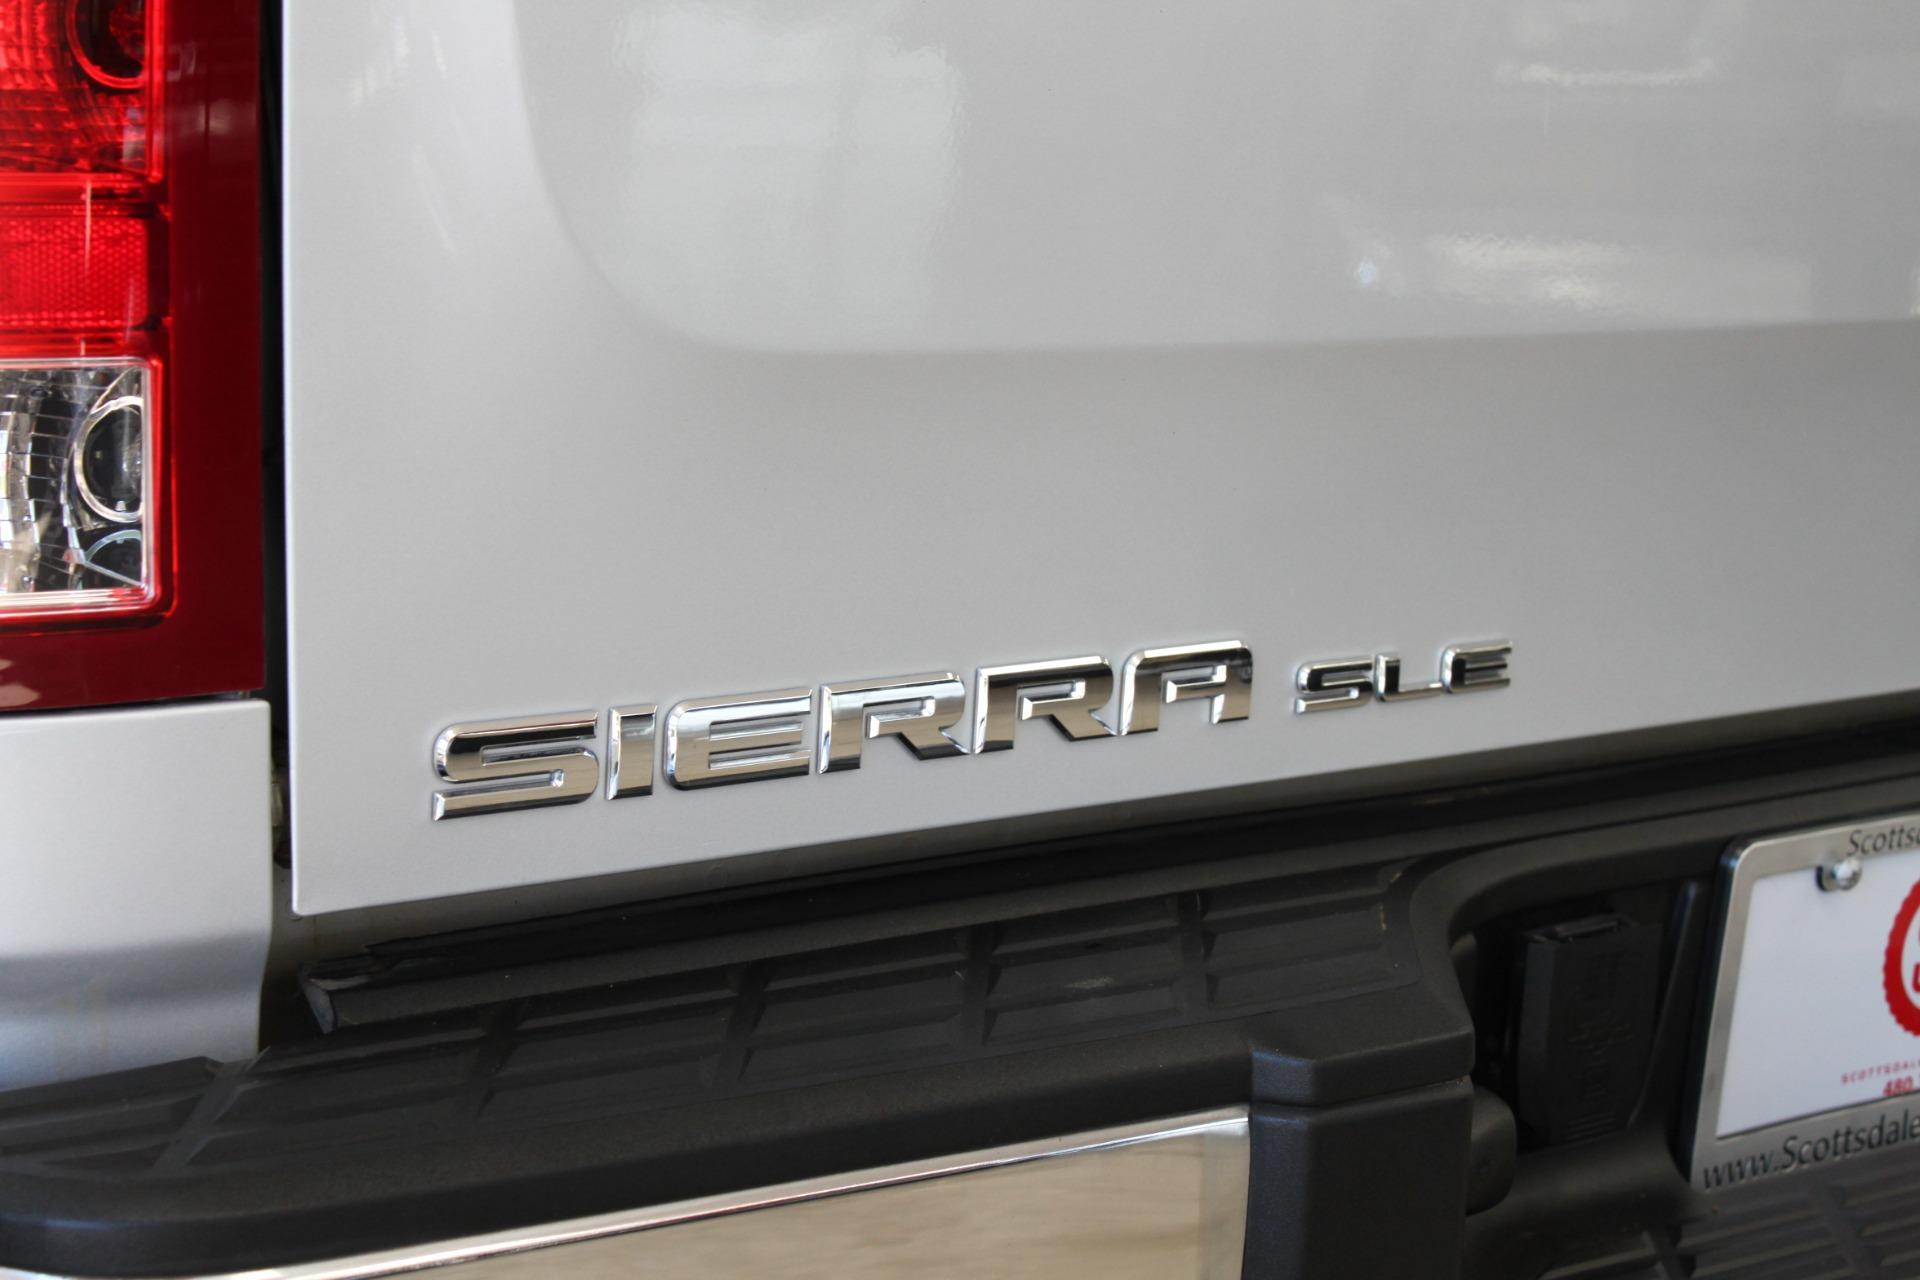 Used-2013-GMC-Sierra-1500-SLE-Z71-4X4-Land-Rover